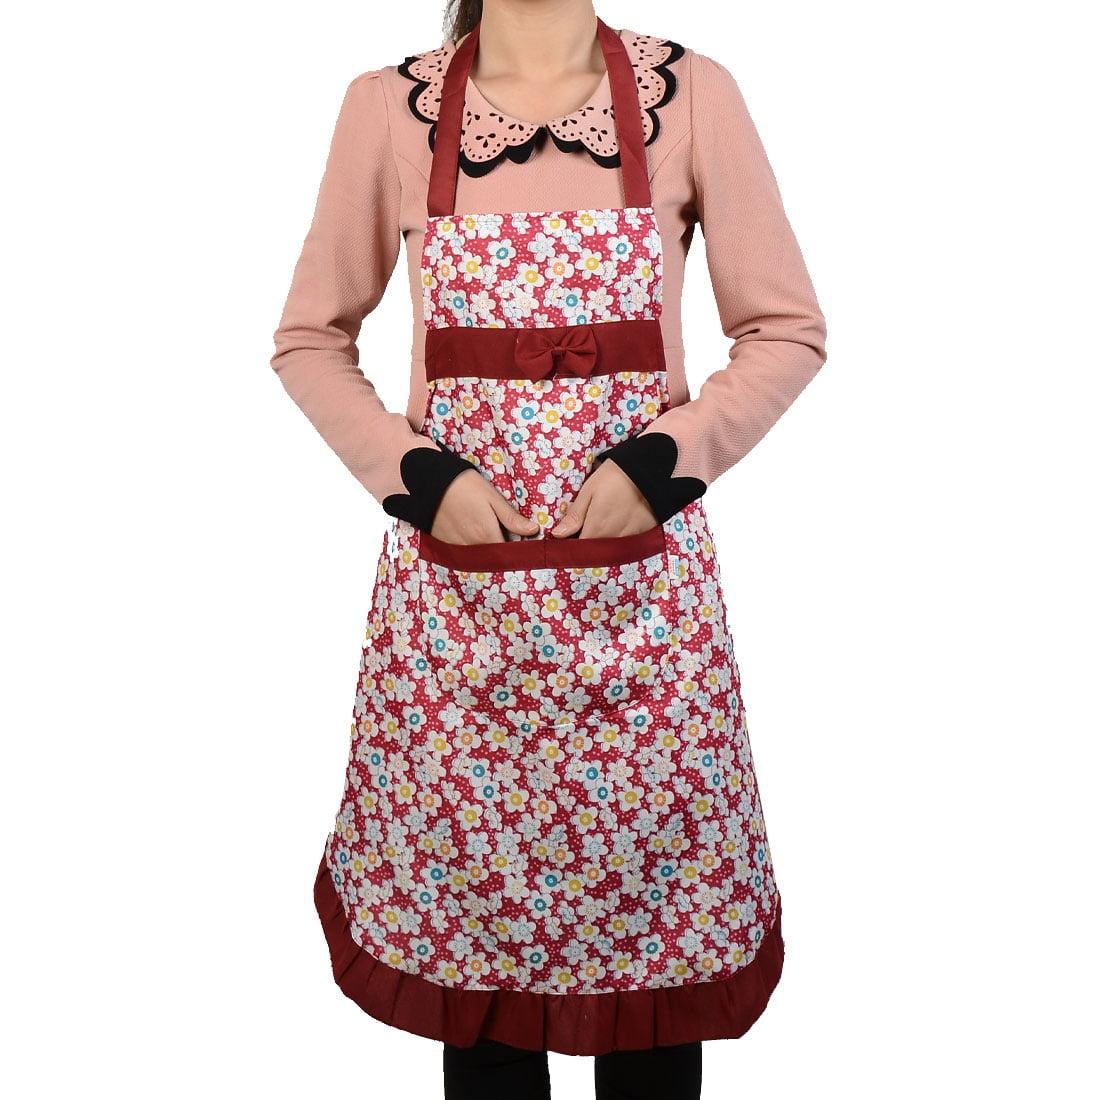 Kitchen Cooking Flower Pattern Lace Detail Pocket Apron Bib Fuchsia for Women